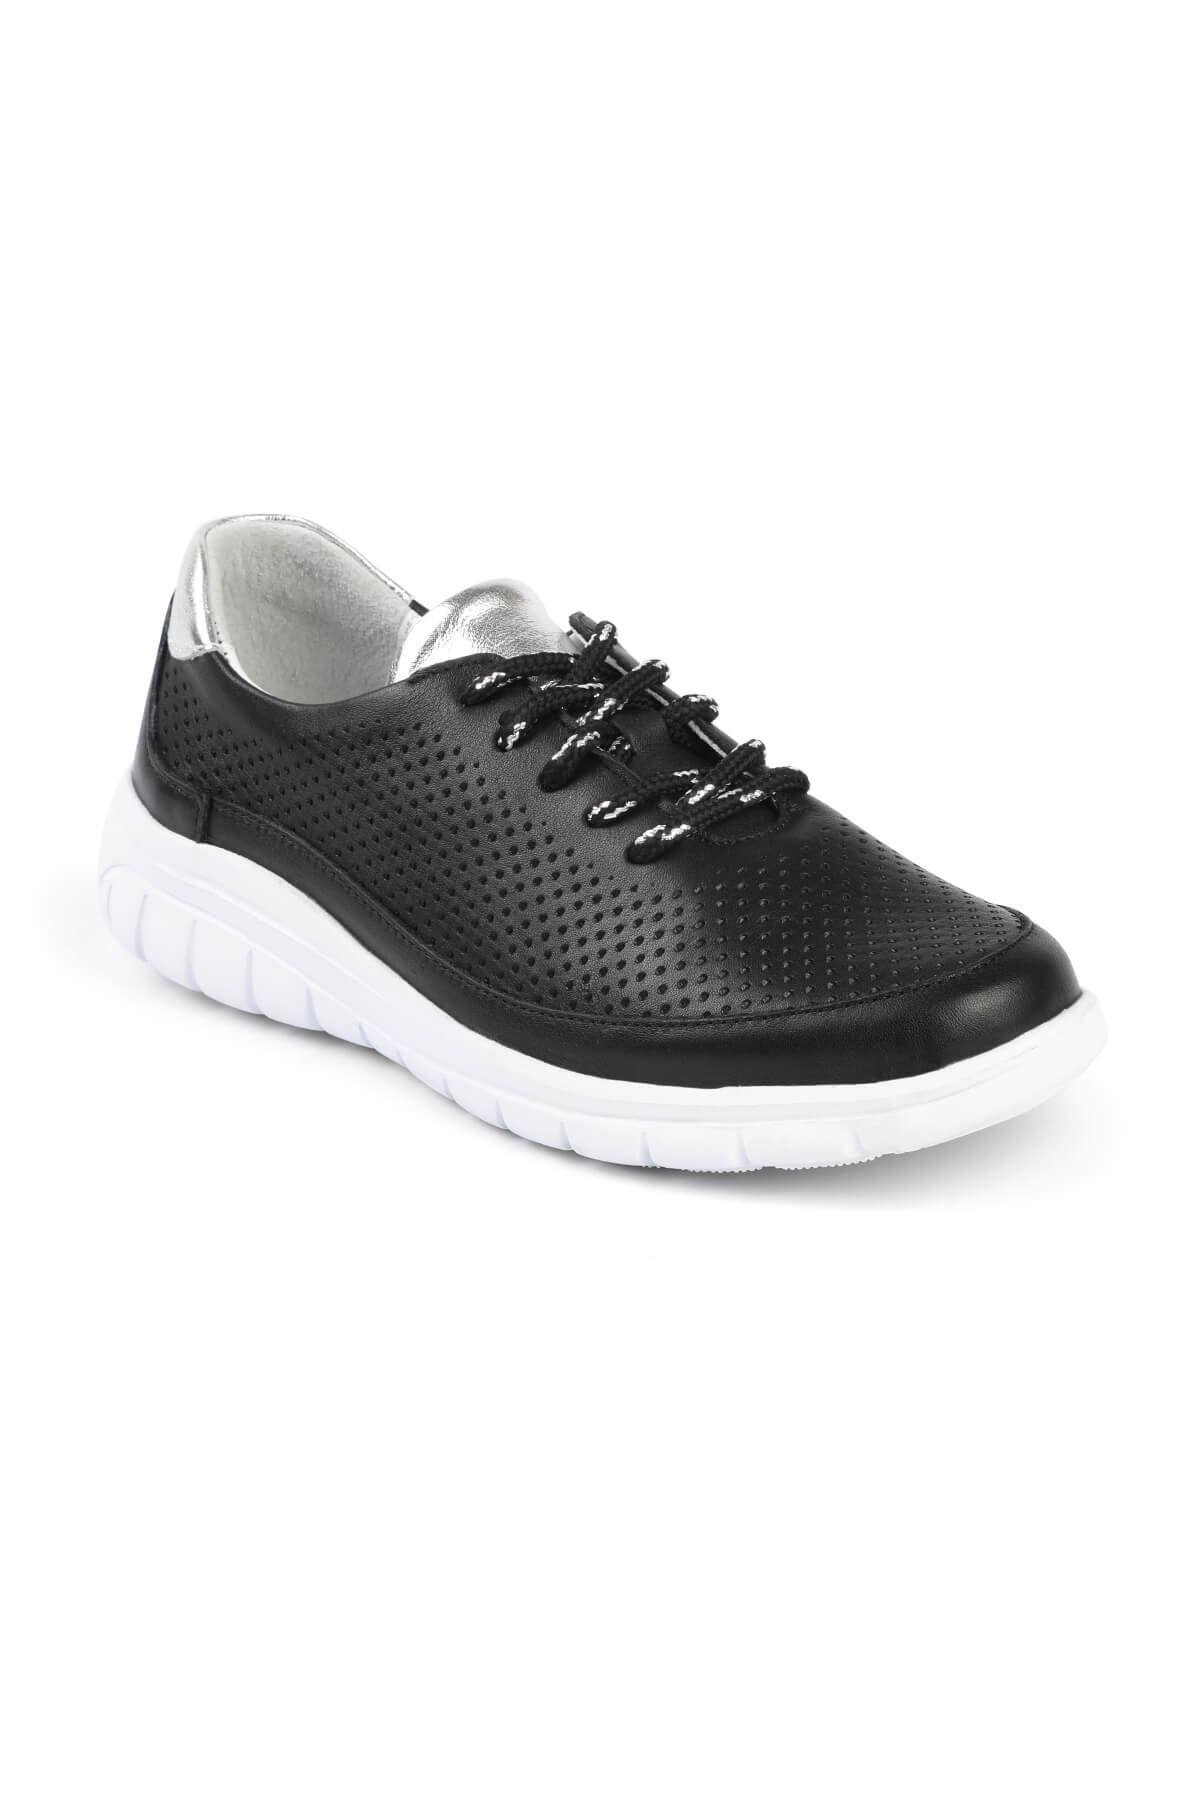 Libero FMS231 Black Sports Shoes